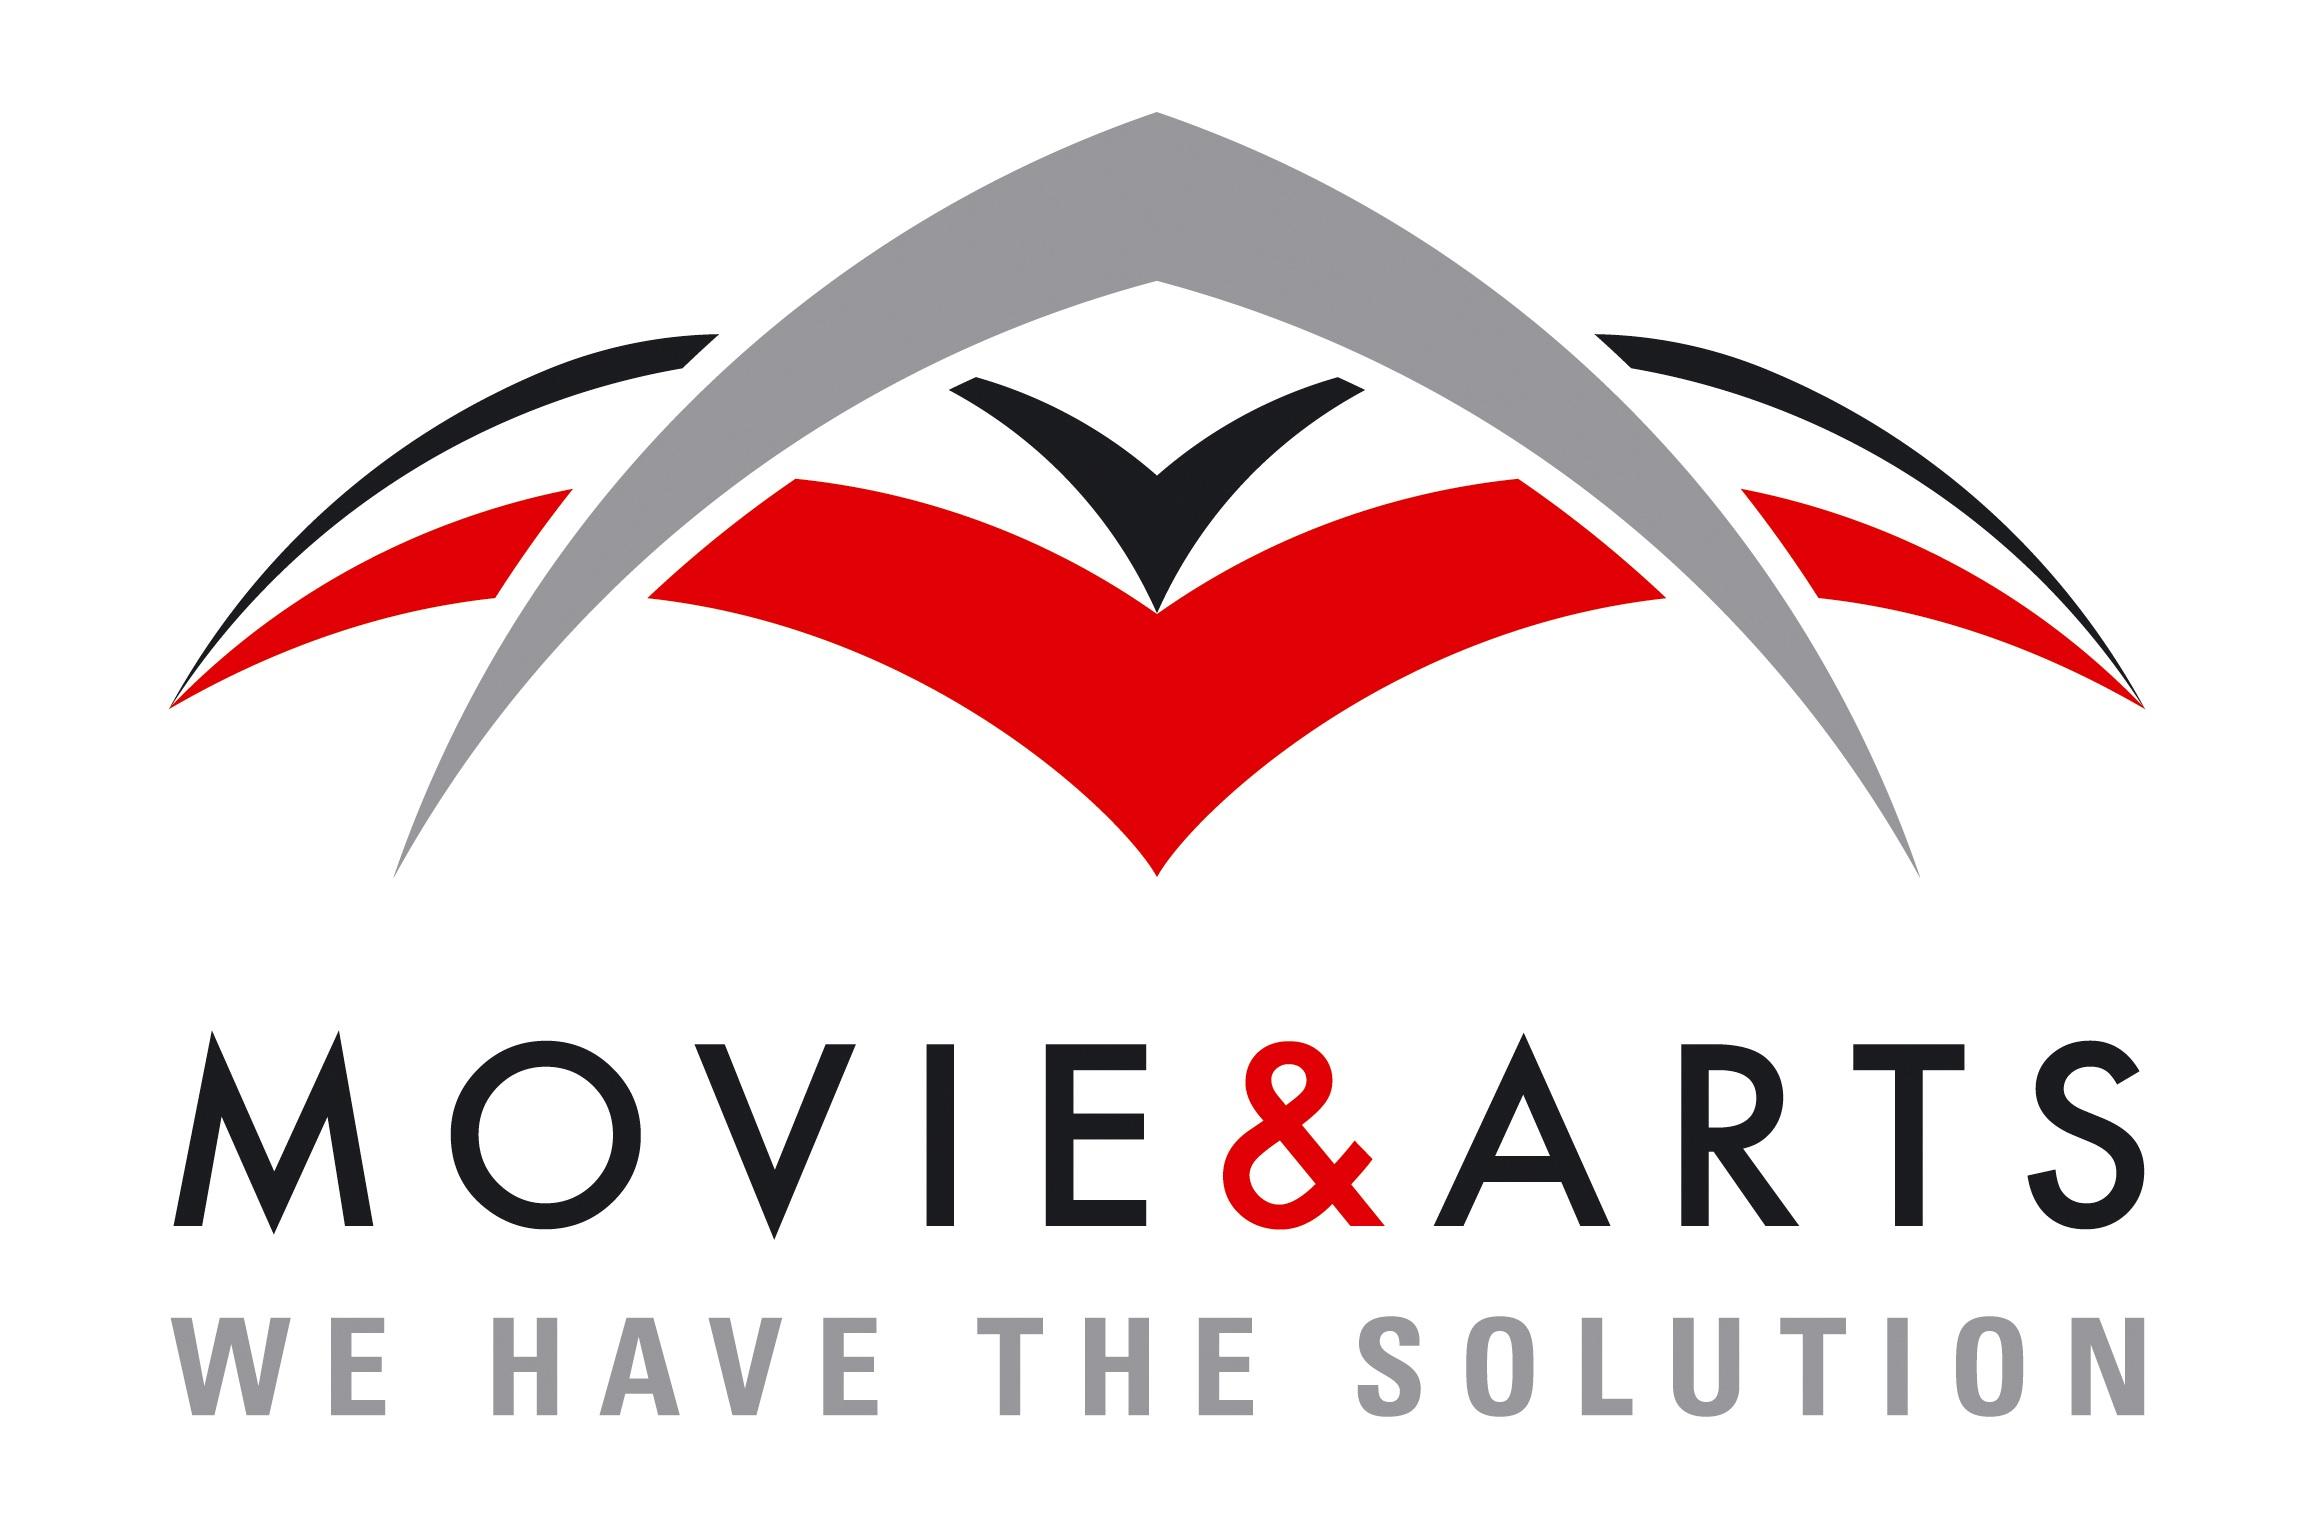 MOVIE & ARTS infiamma il web con Action & Branding